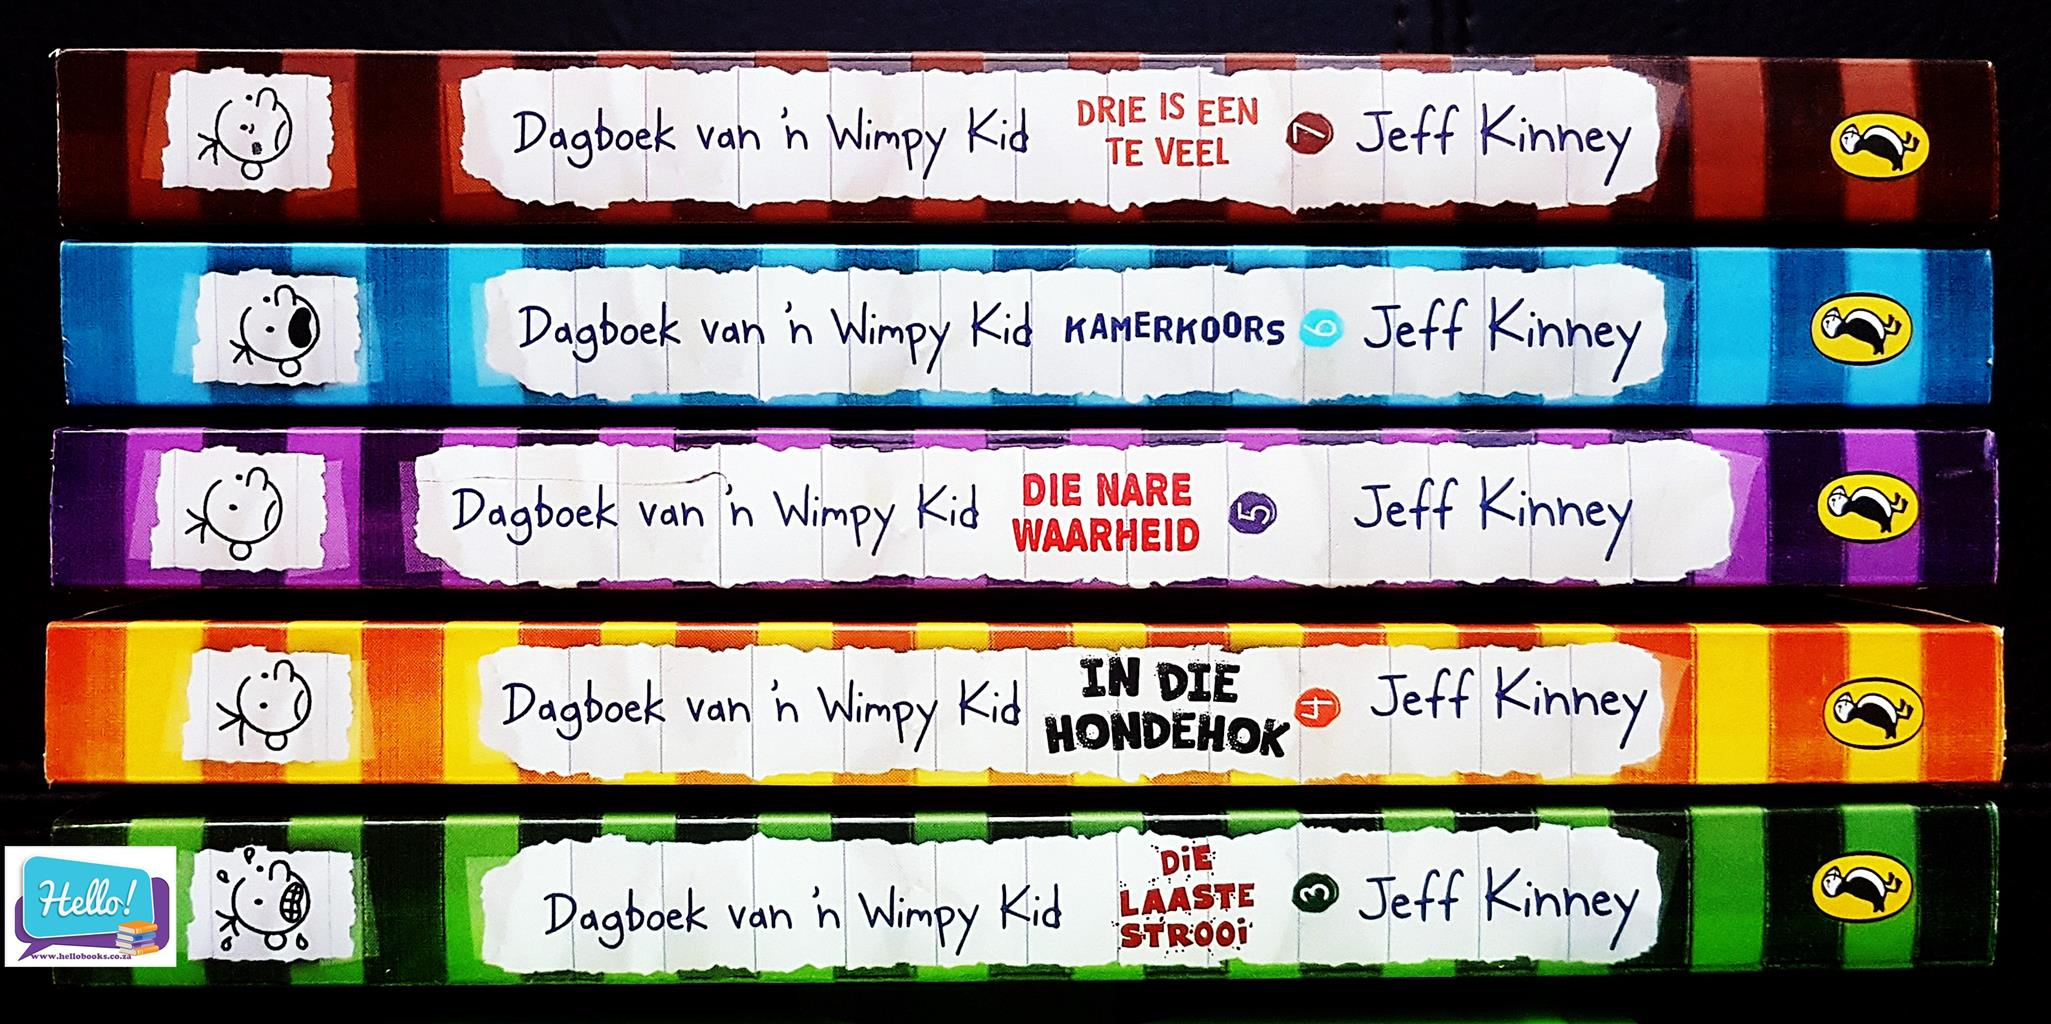 Jeff Kinney Dagboek van 'n Wimpy Kind